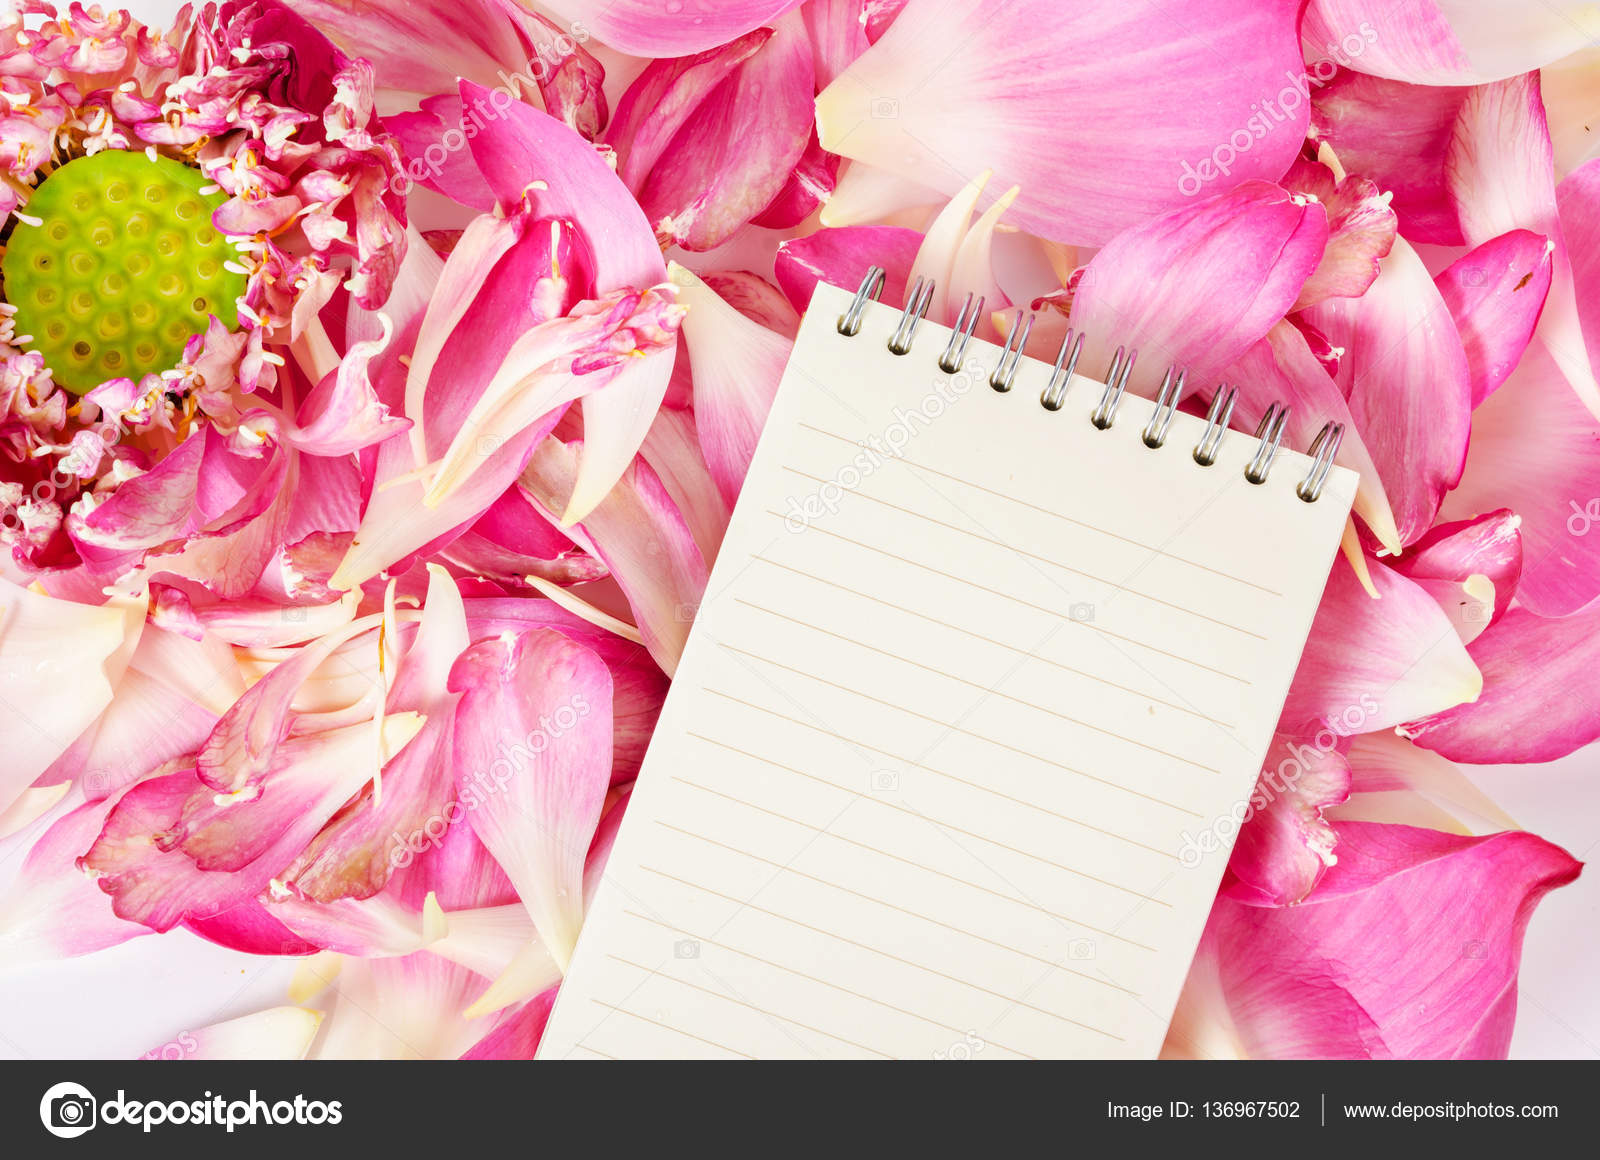 Open blank diary on blooming pink lotus flower stock photo open blank diary on blooming pink lotus flower stock photo izmirmasajfo